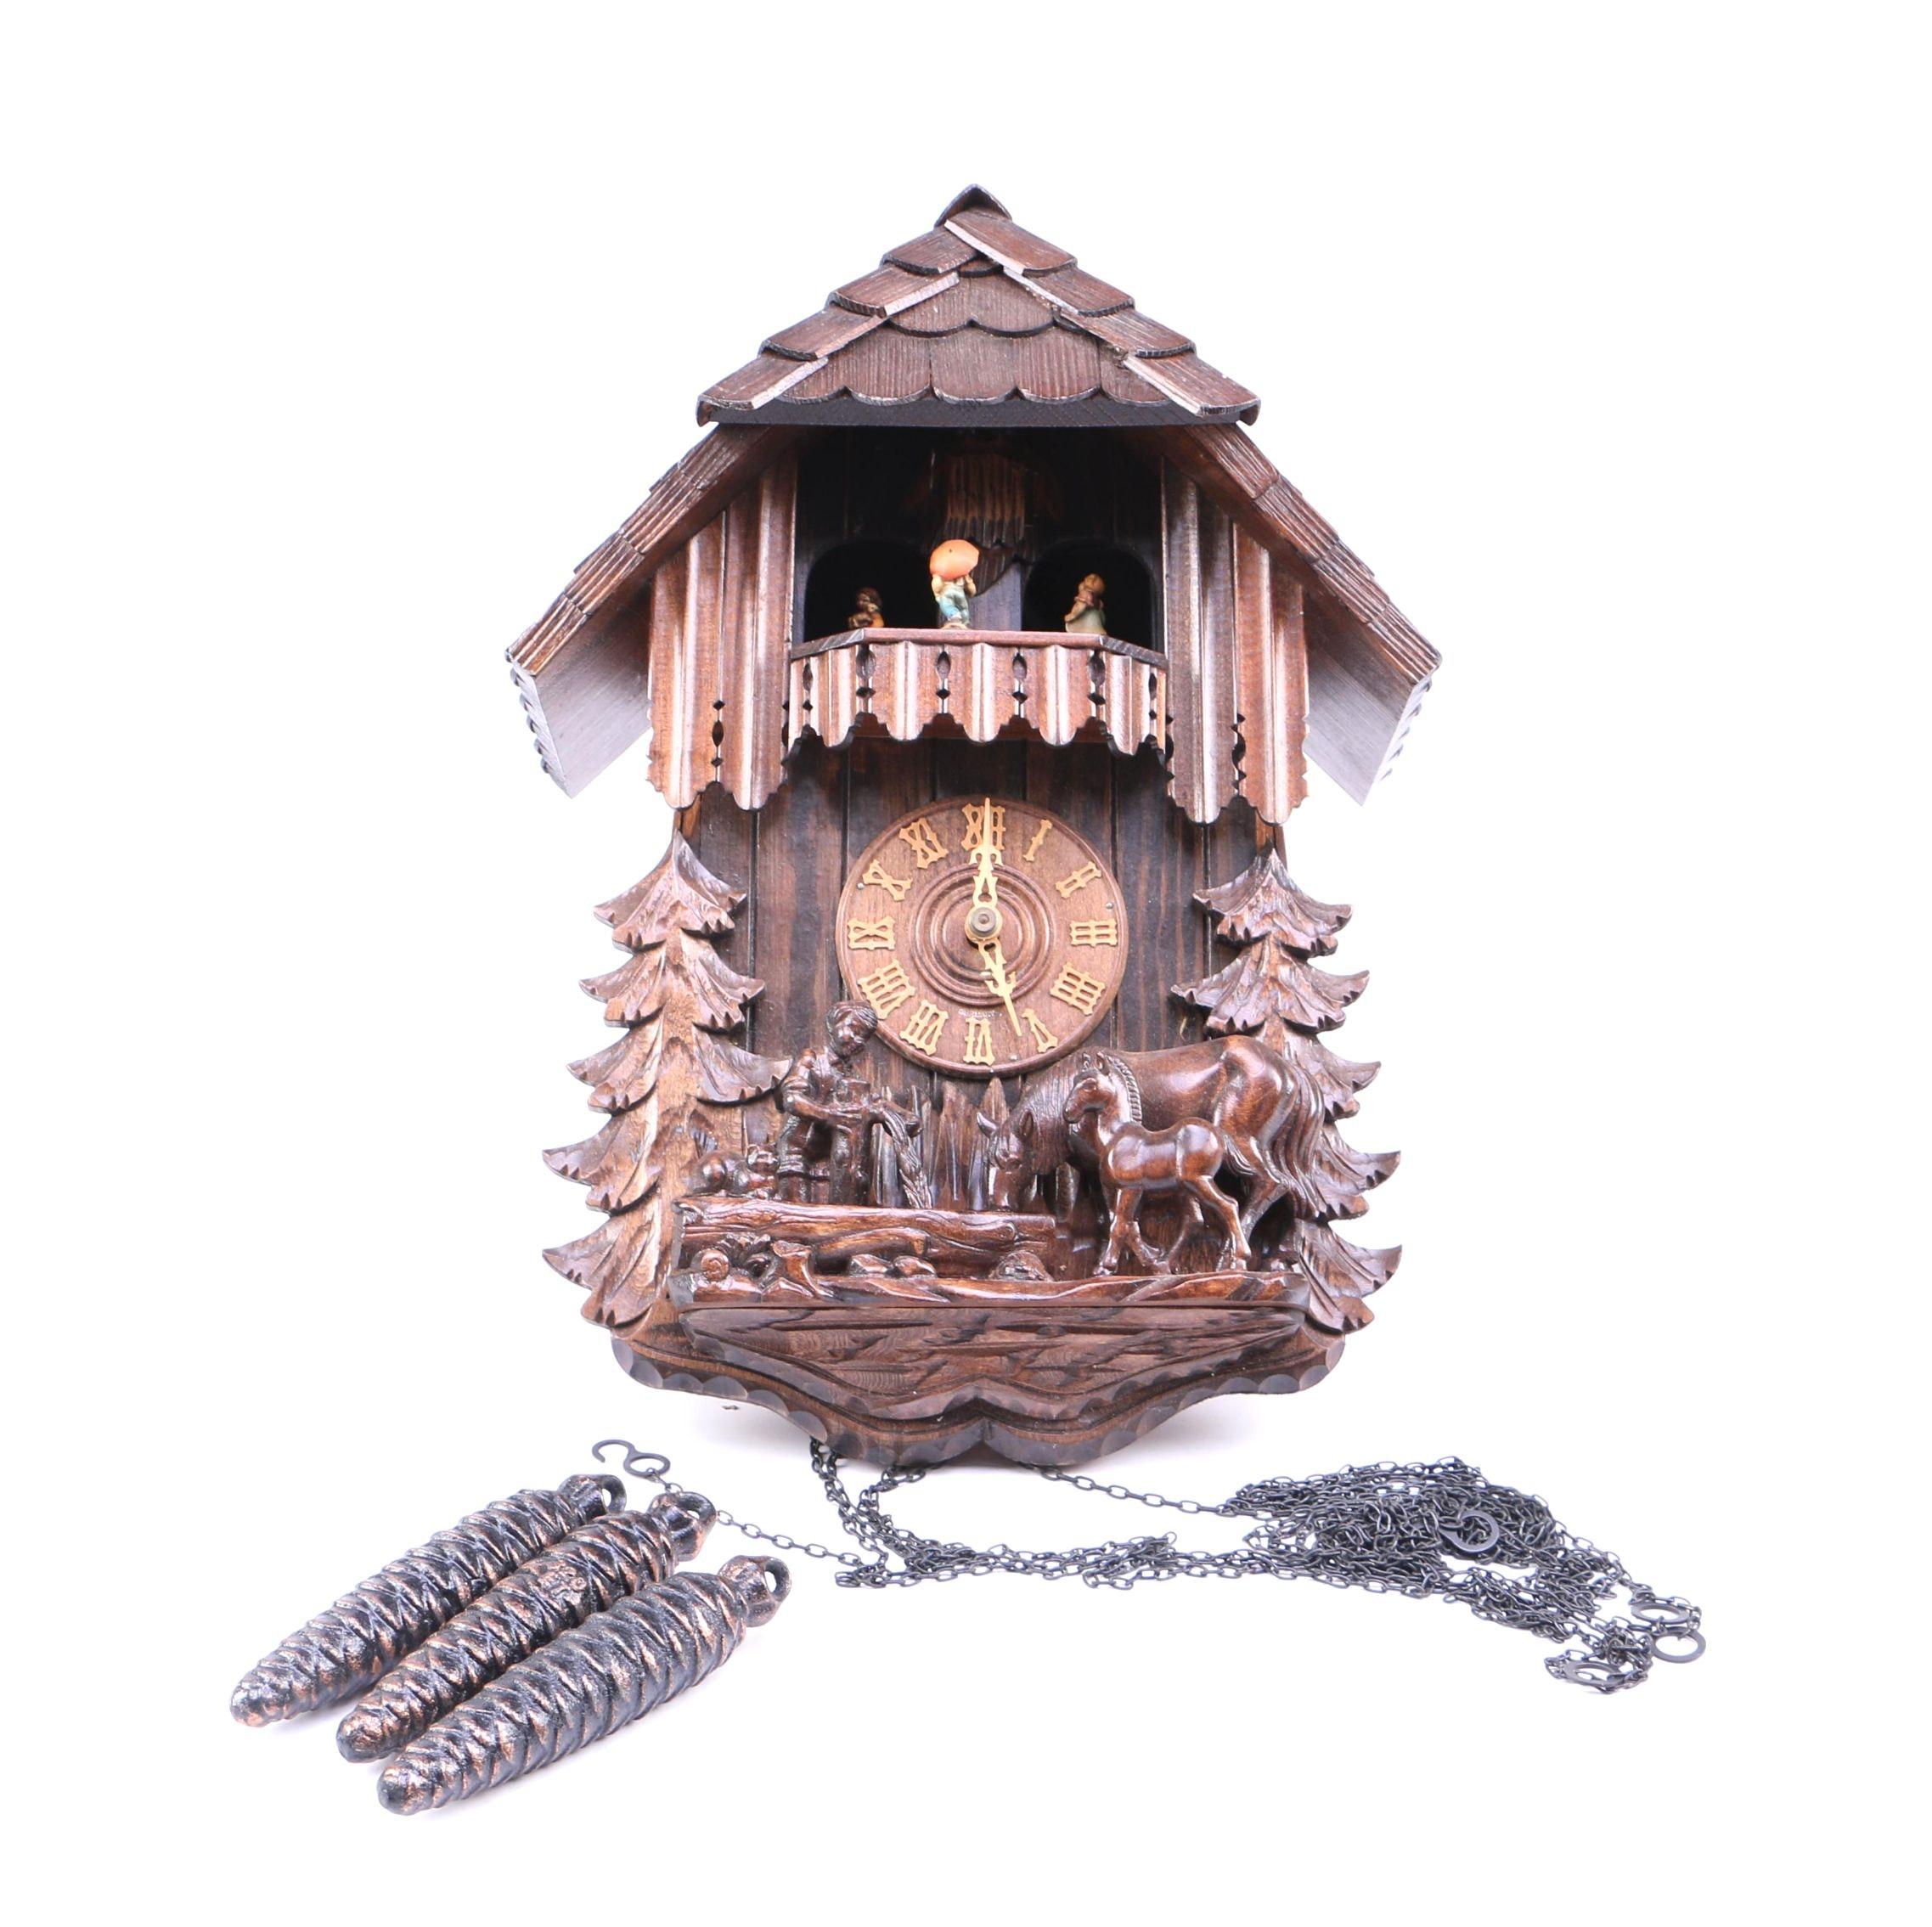 Carved Wooden German Cuckoo Clock